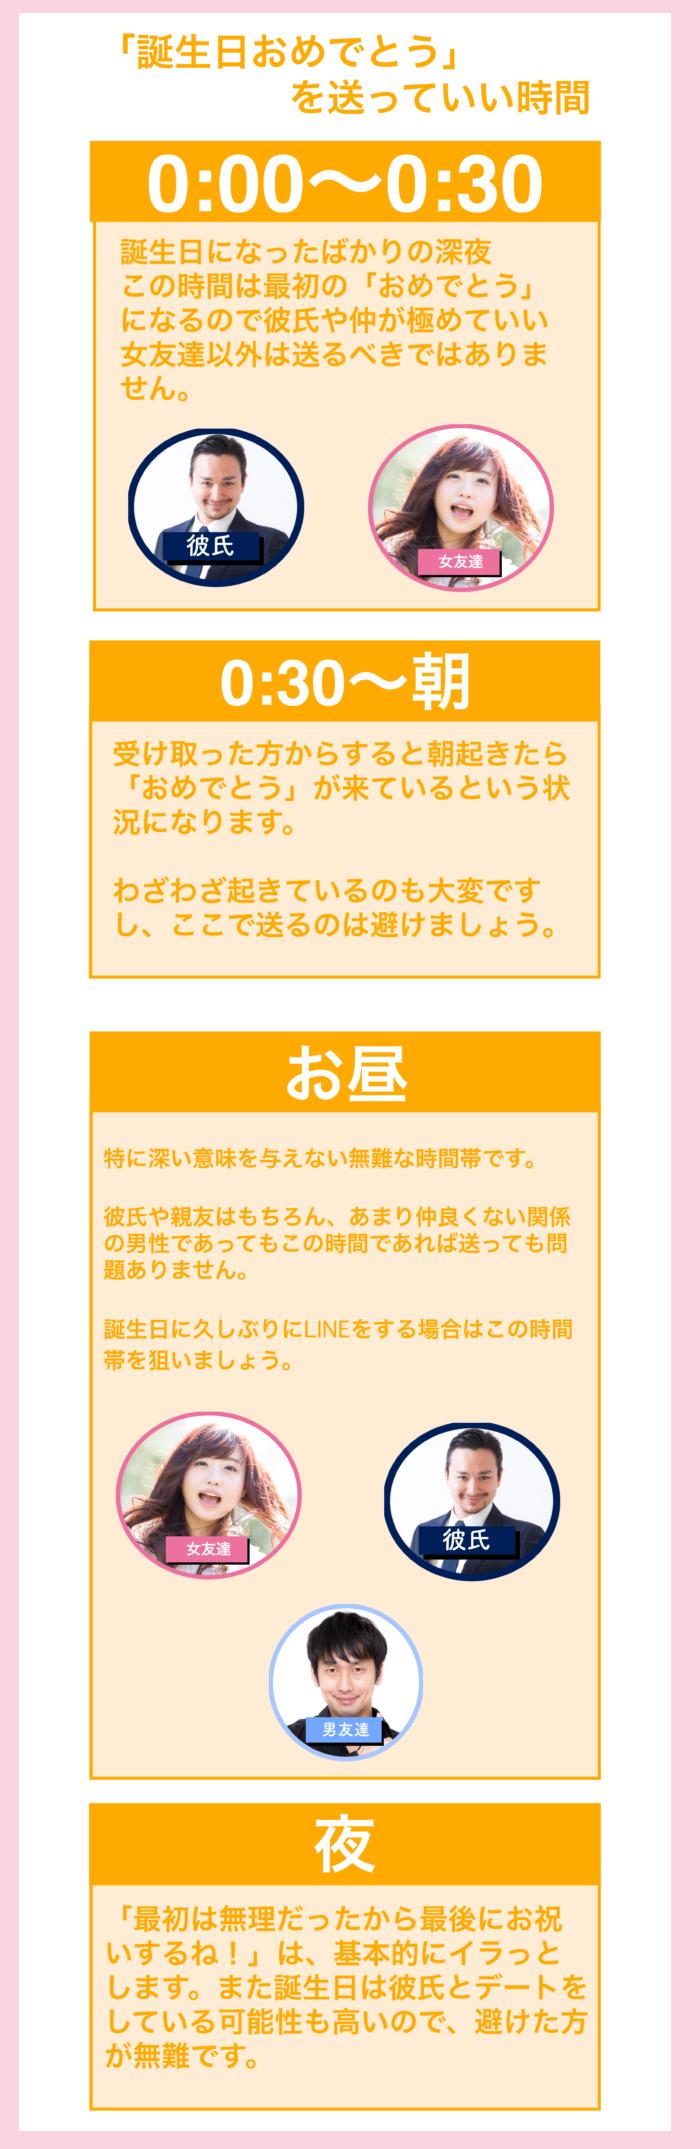 Line 友達 の 誕生 日